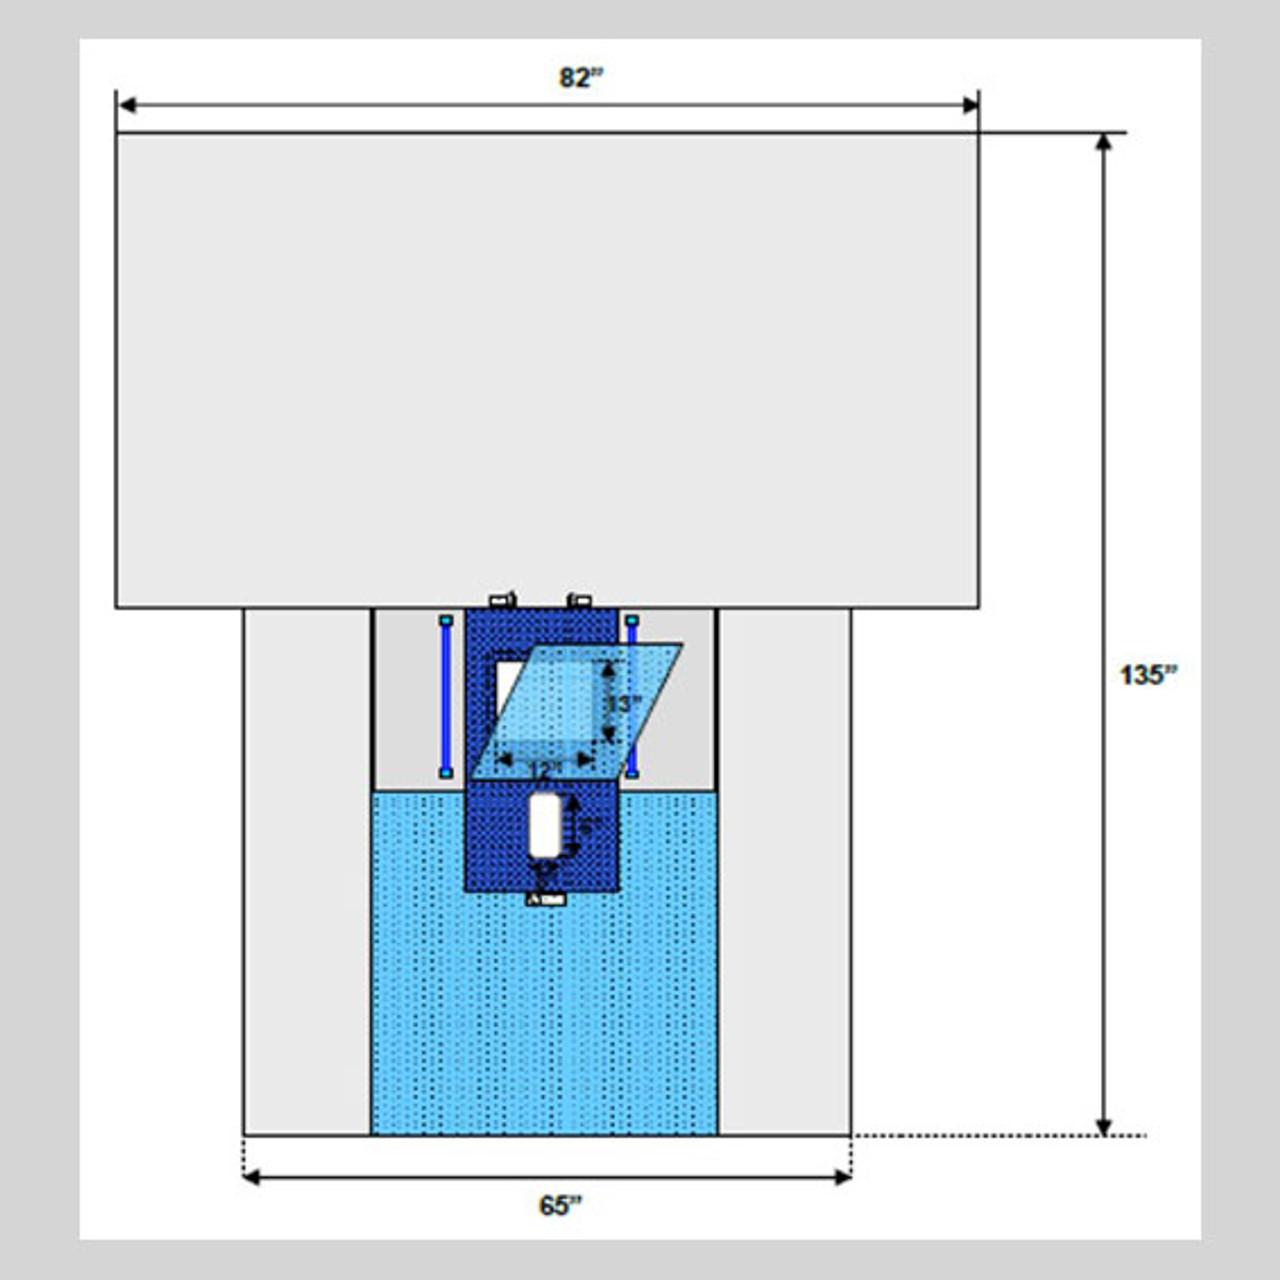 "Laparoscopic/Pelviscopy Abdominal Drape, 82"" x 65"" x 135"", Robotic Friendly"